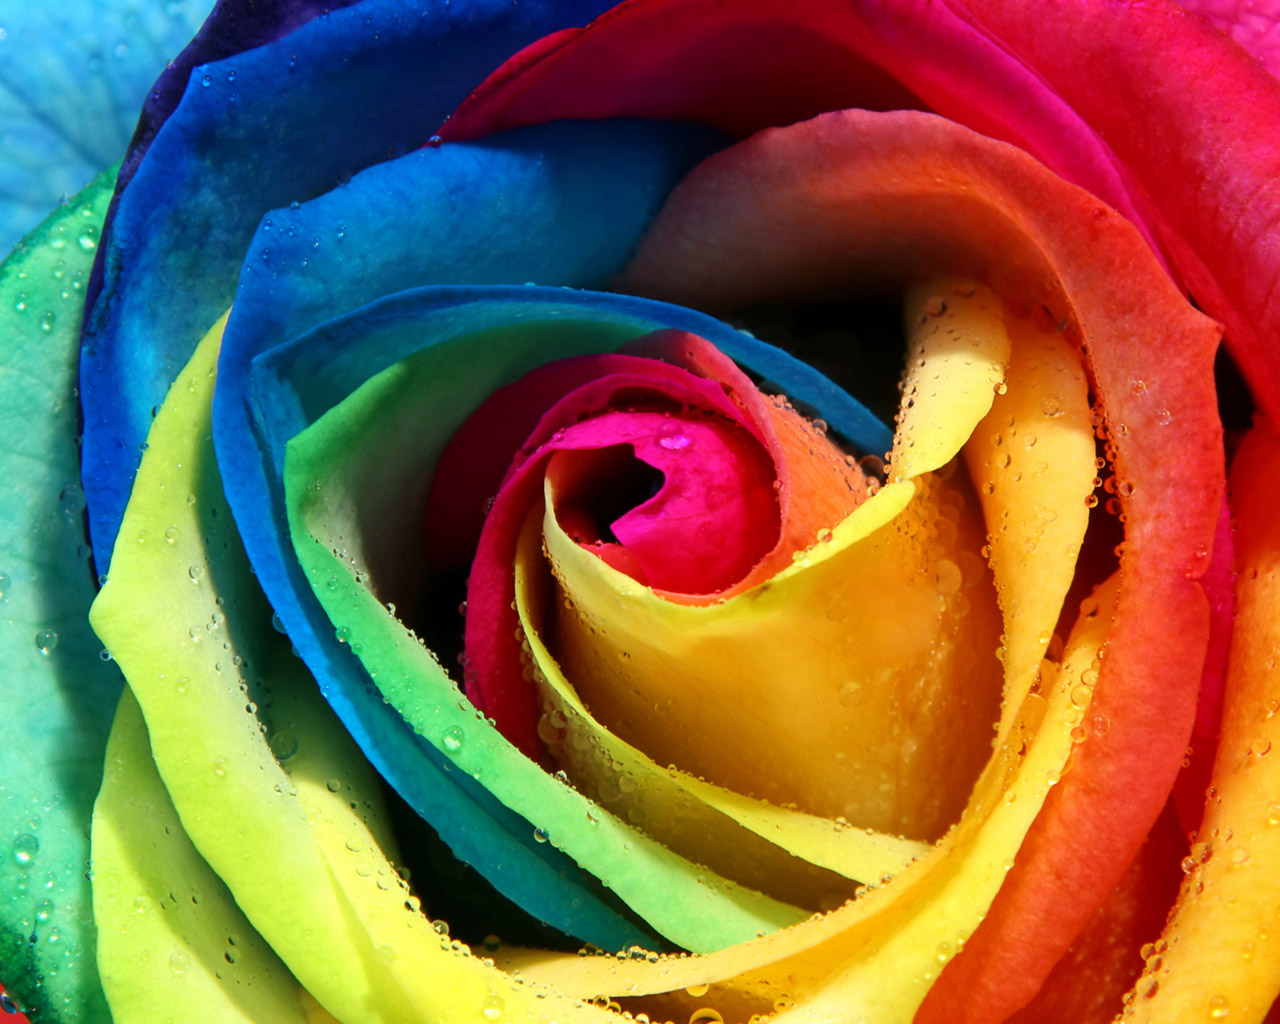 Cute And Cool Wallpapers Giy Cute Rose Hd Wallpaper Hd Wallpaper